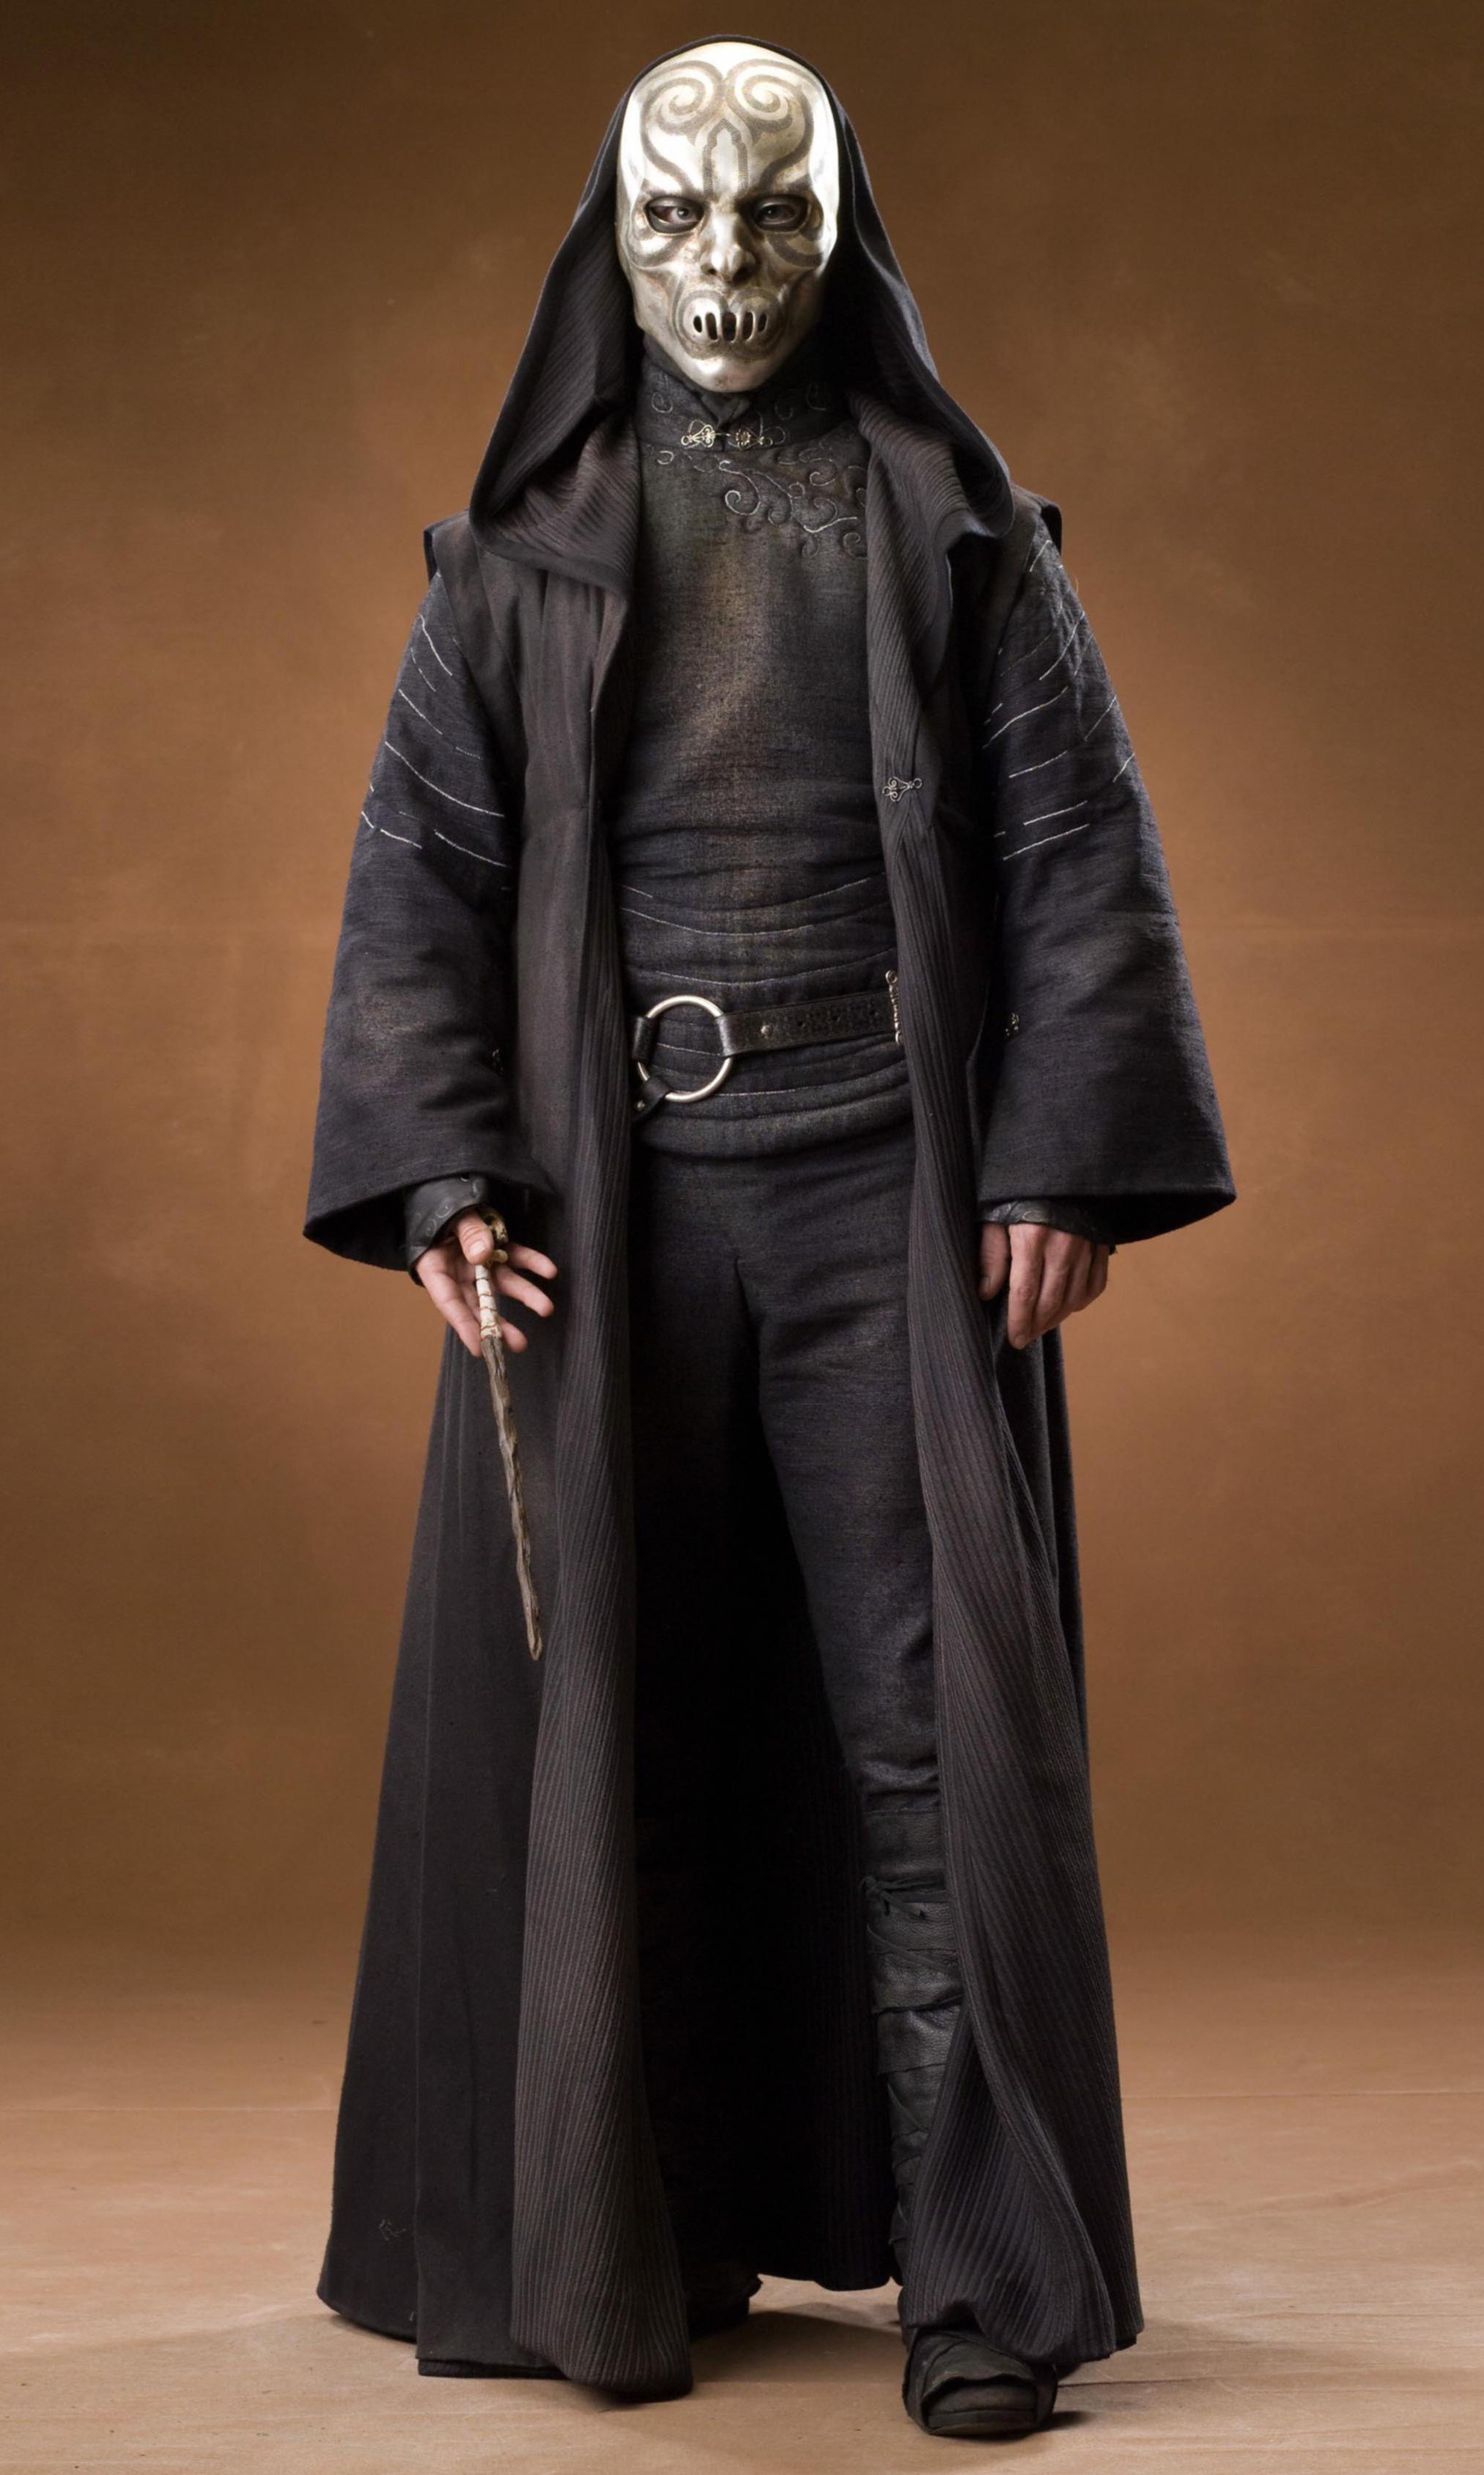 Robes | Harry Potter Wiki | FANDOM powered by Wikia